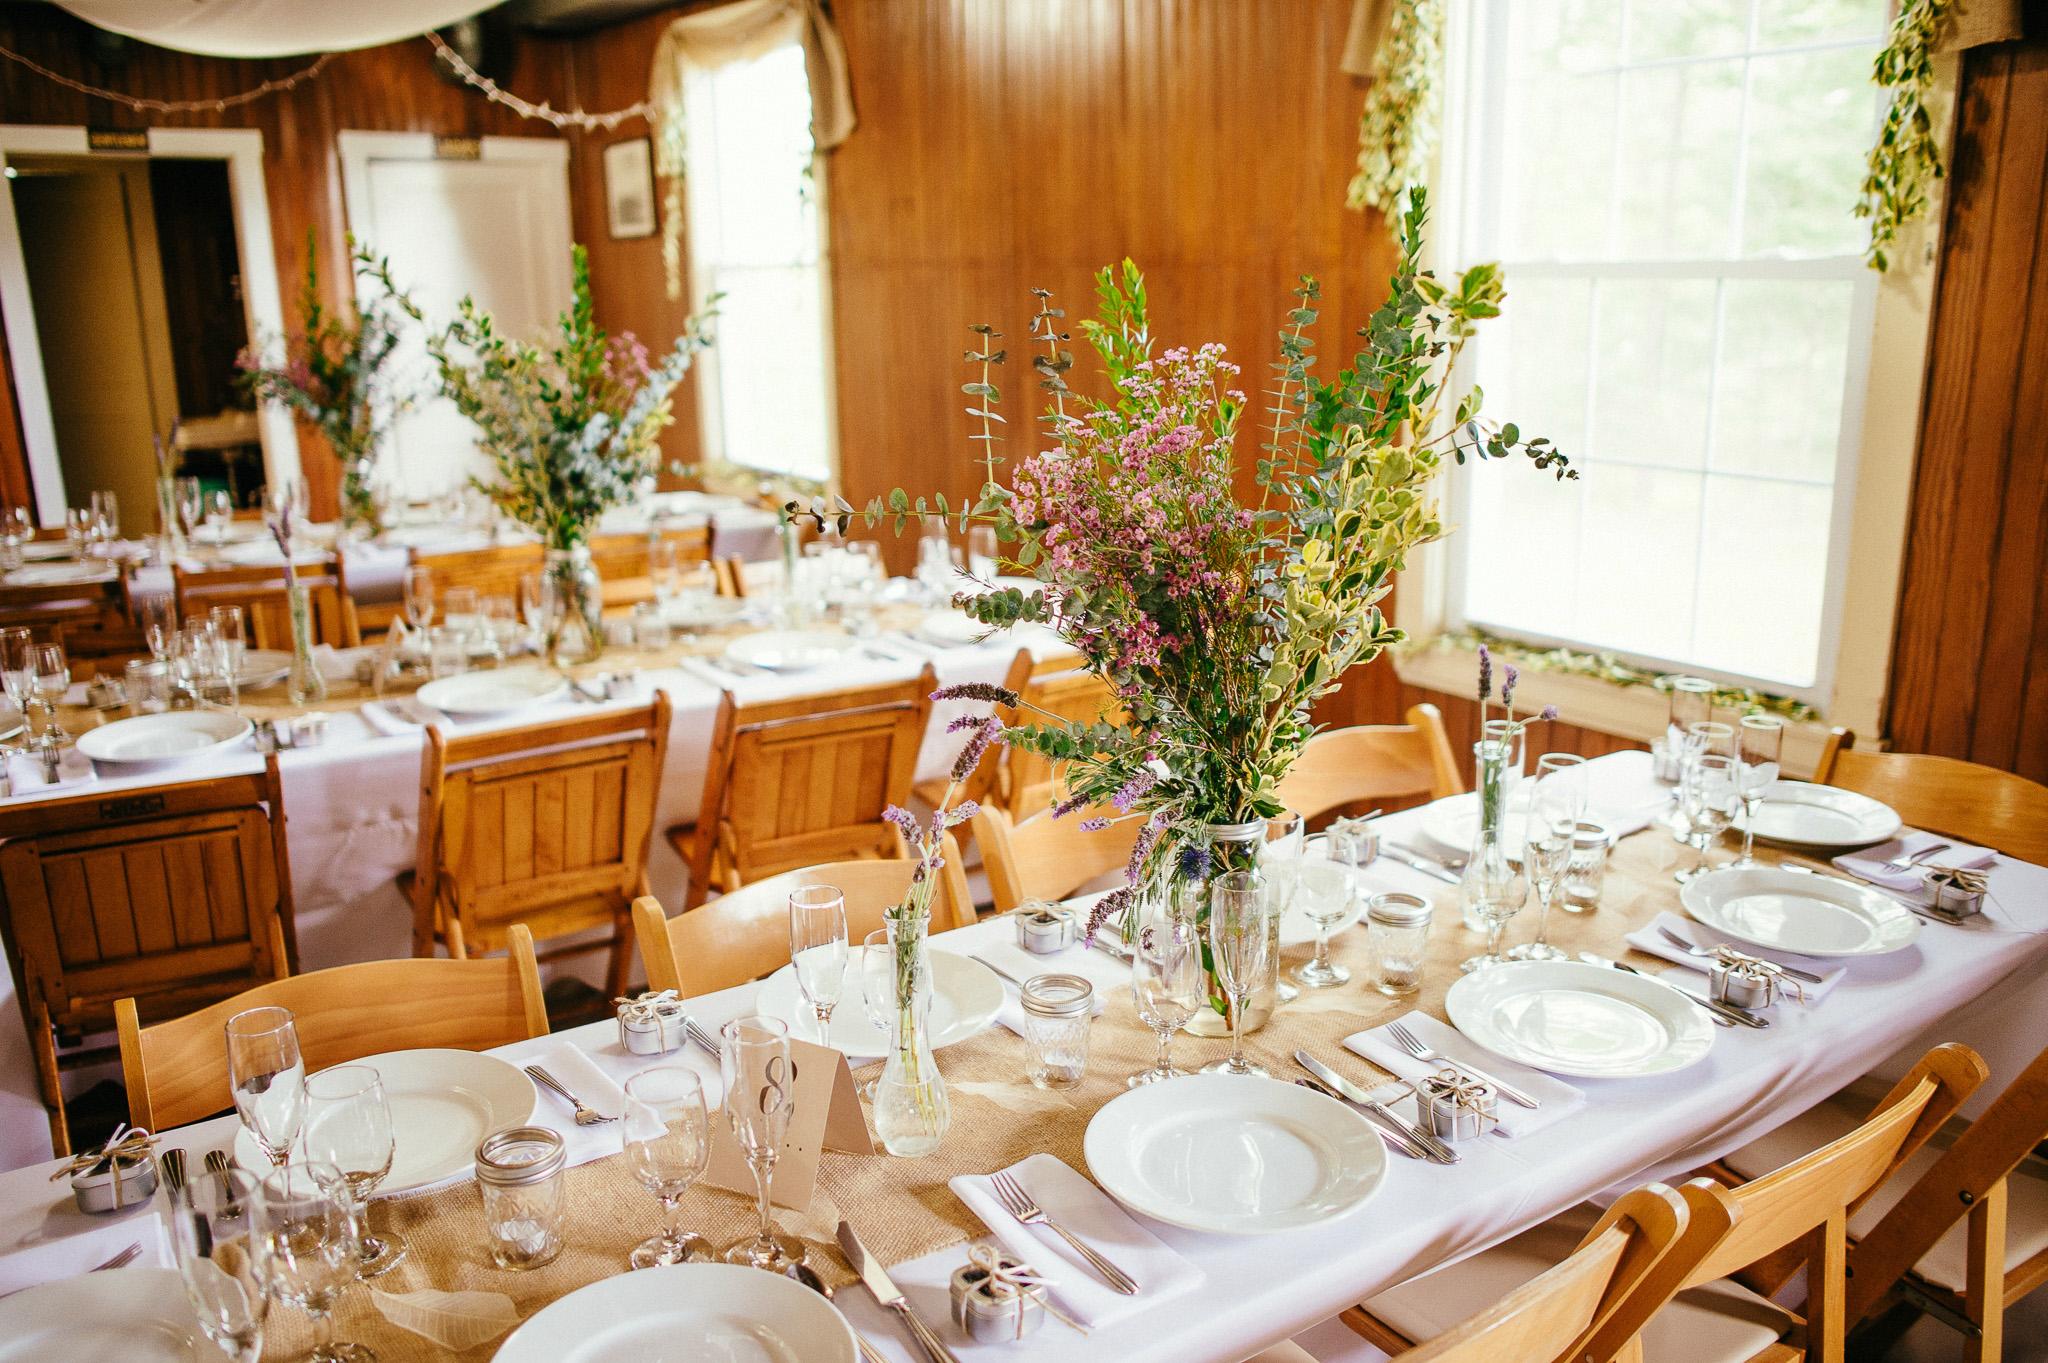 Sprague Hall Wedding Reception Cape ElizabethMaine, DIY Lavender and Natural Flowers